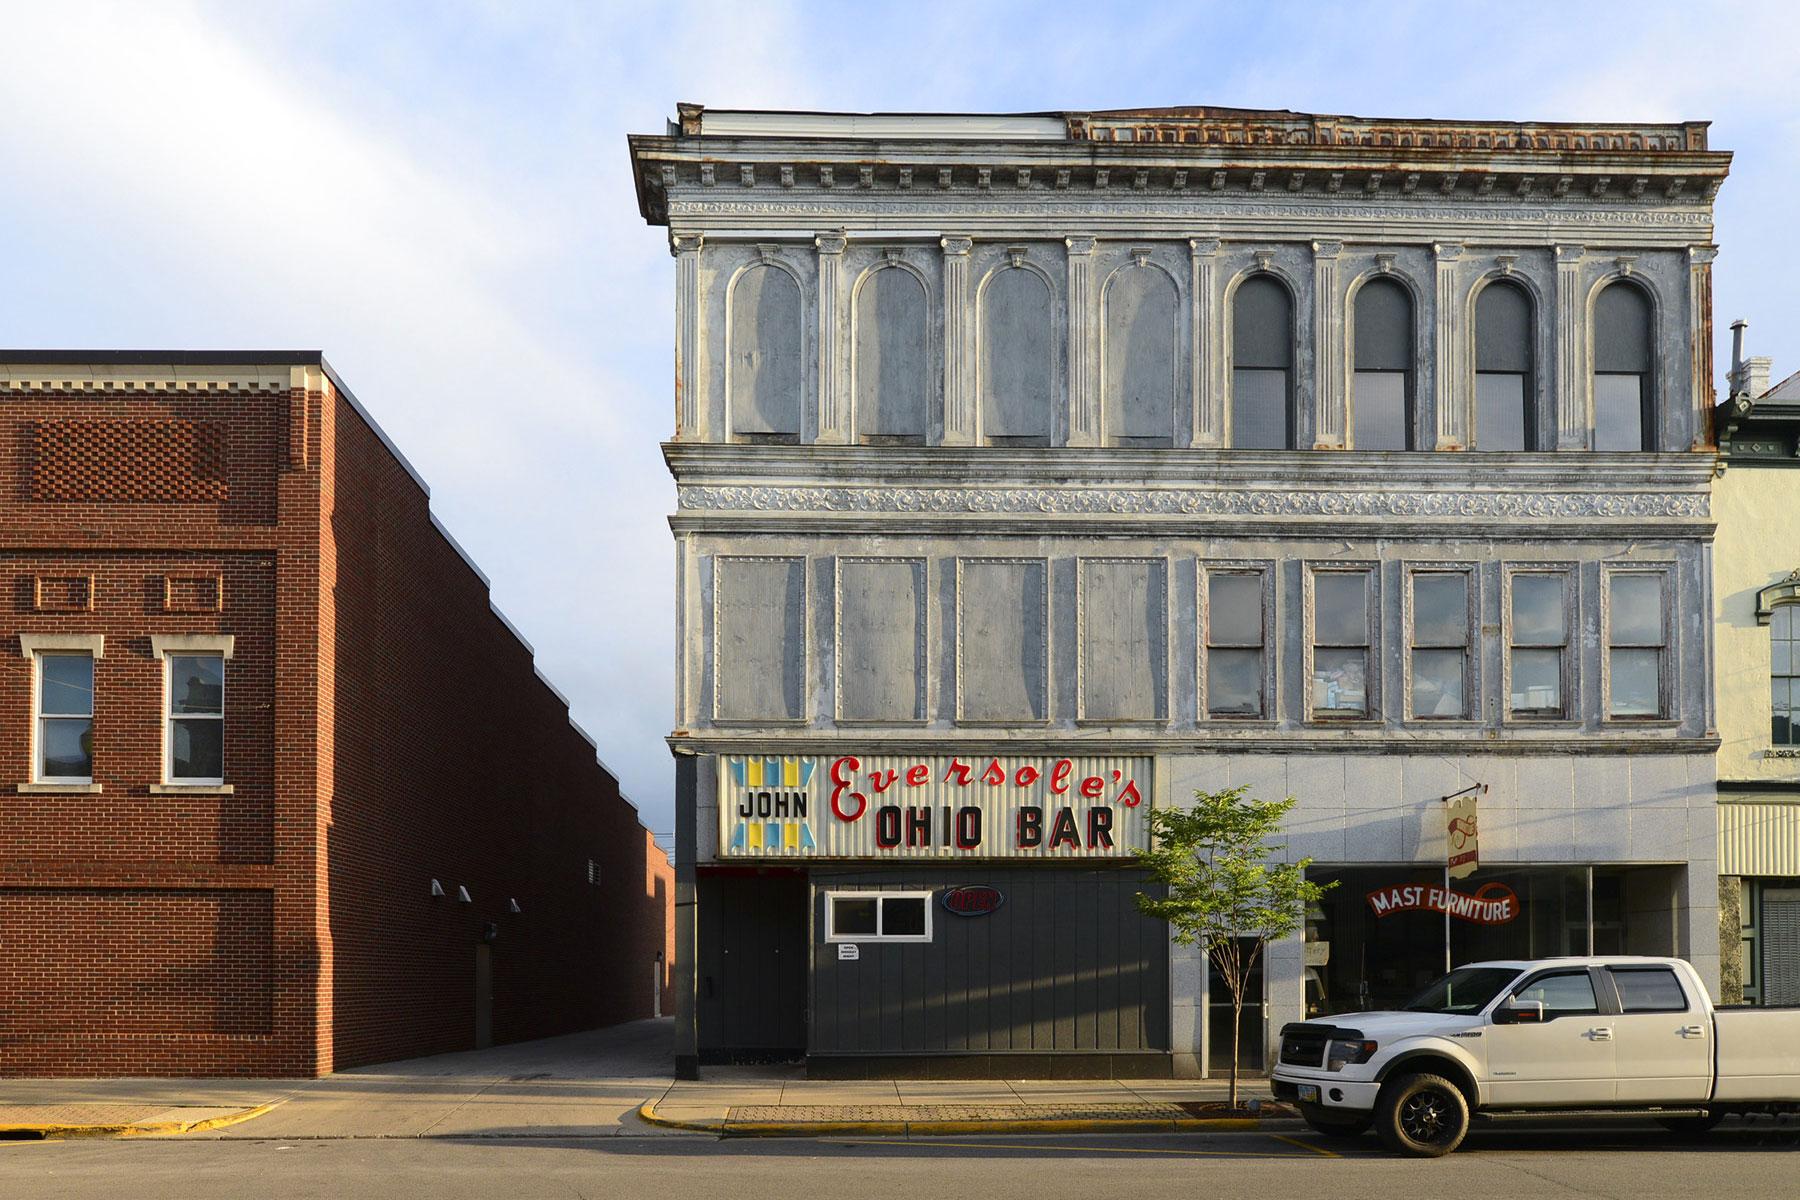 Ohio Bar